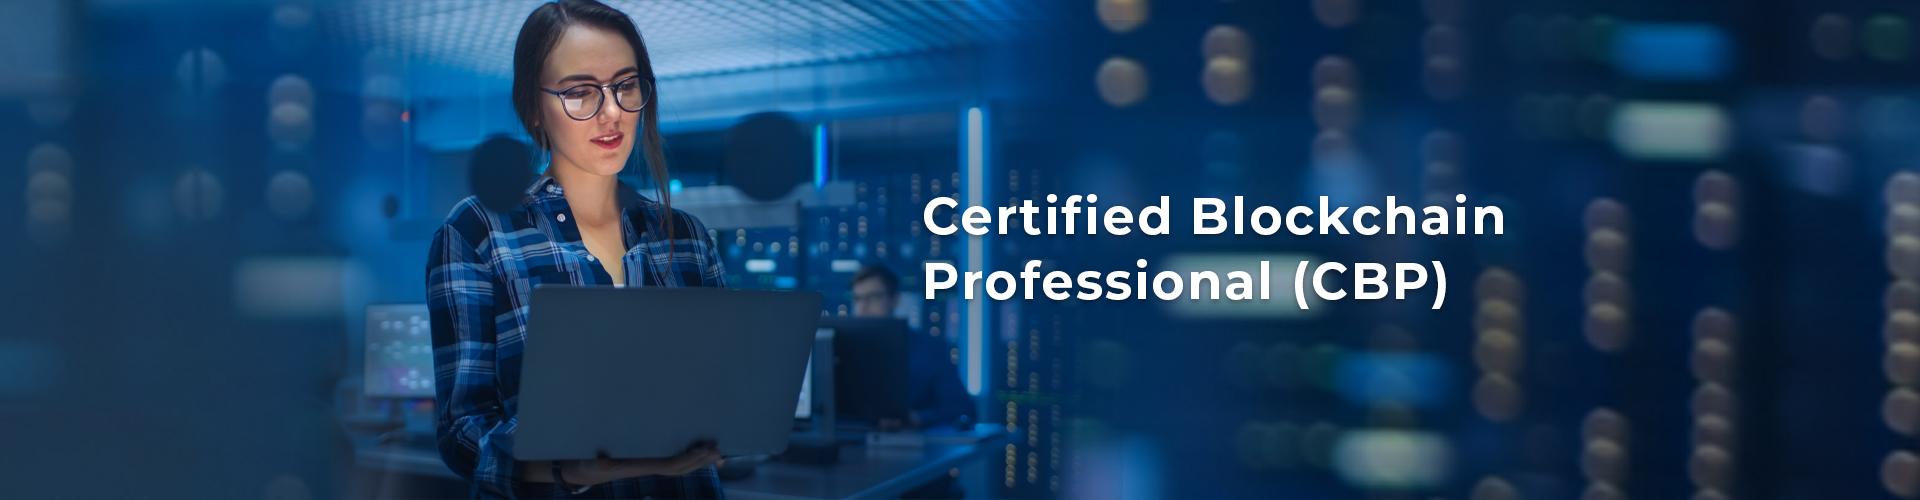 Certified Blockchain Professional